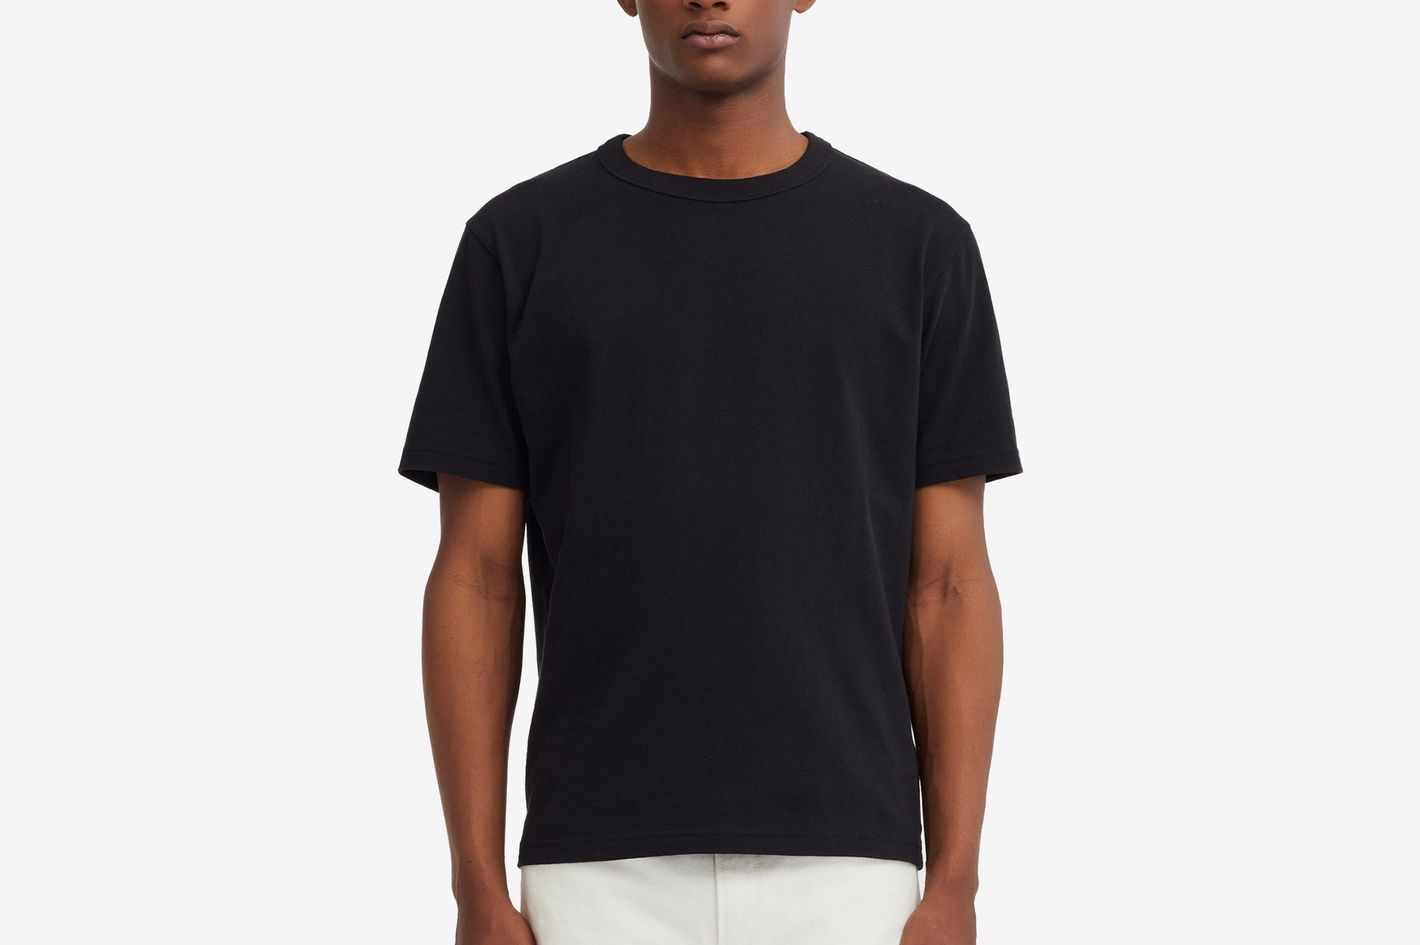 Uniqlo U Crewneck Short Sleeve T-shirt